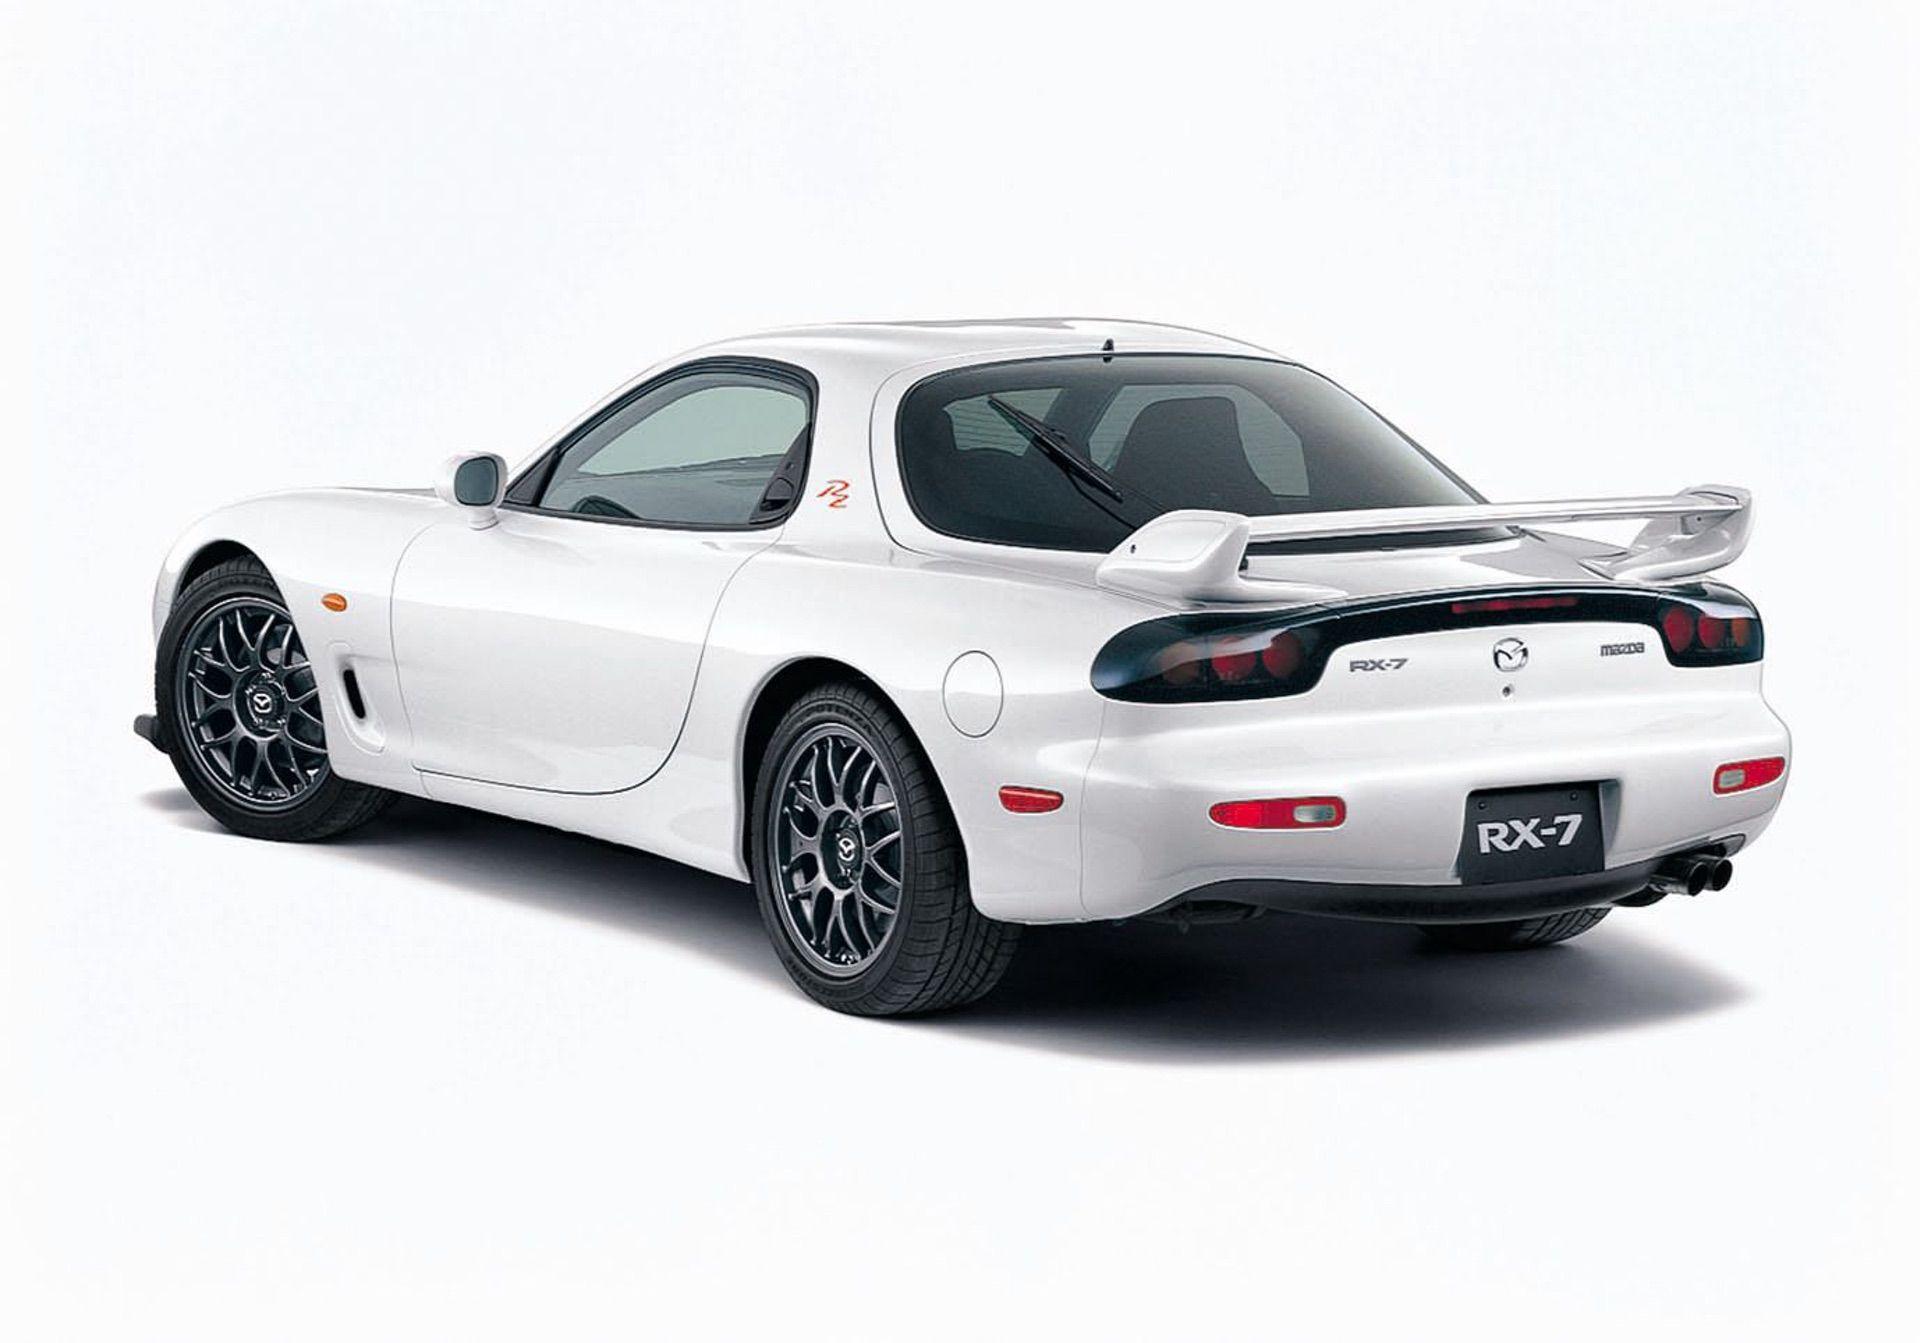 Mazda_RX-7_history_0072